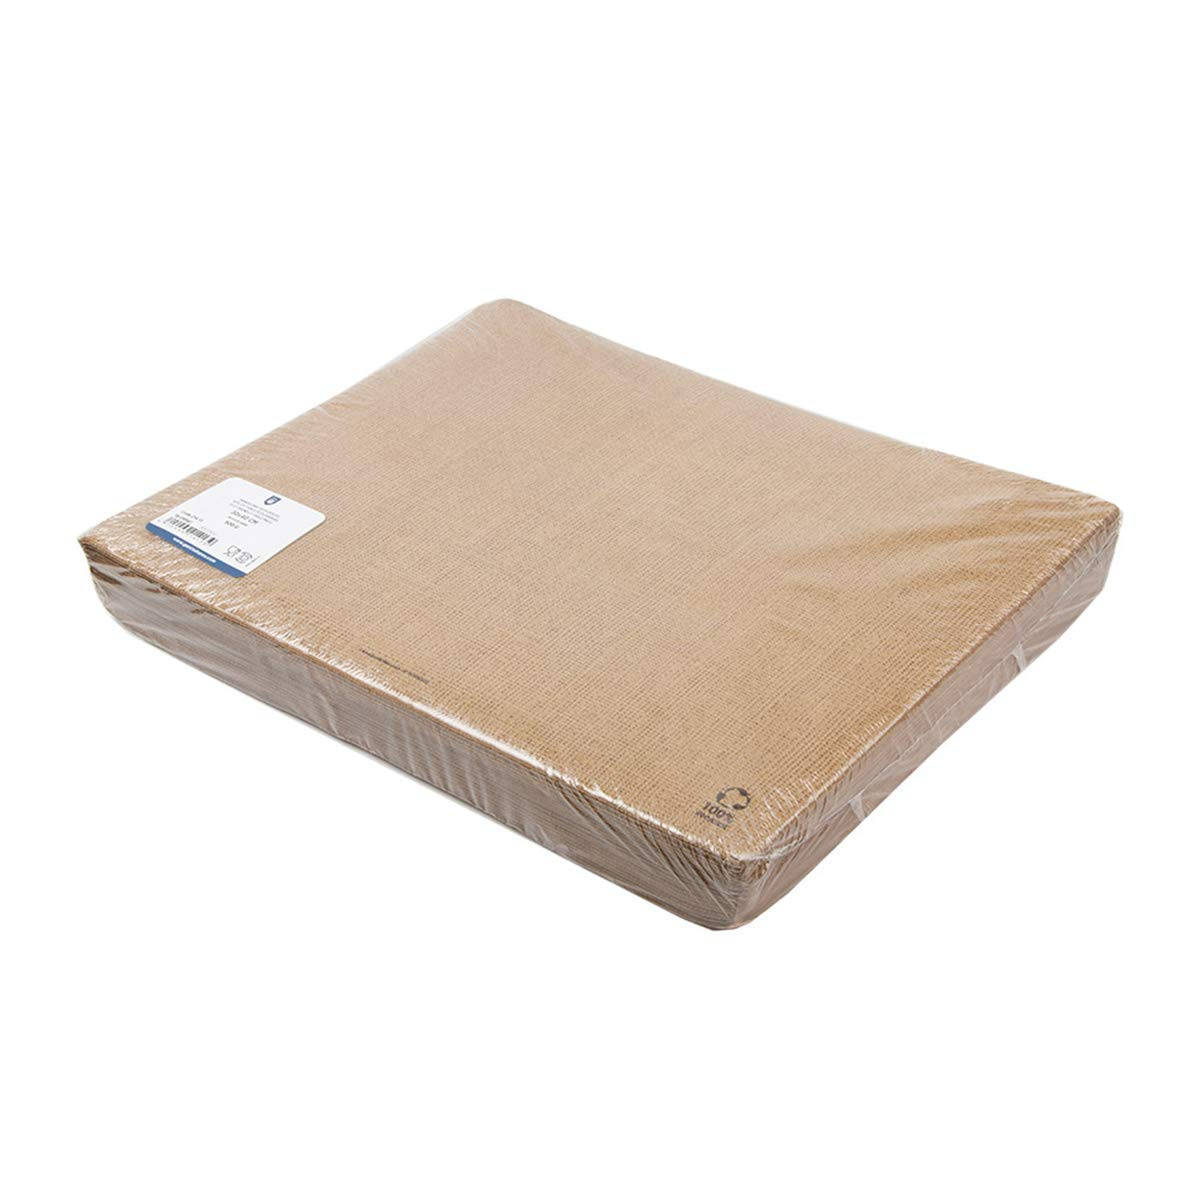 Garc/ía de Pou Eco-Friendly Table Mats  Arpillera 48 Gsm 30X40 Cm Marr/ón Recycled Paper